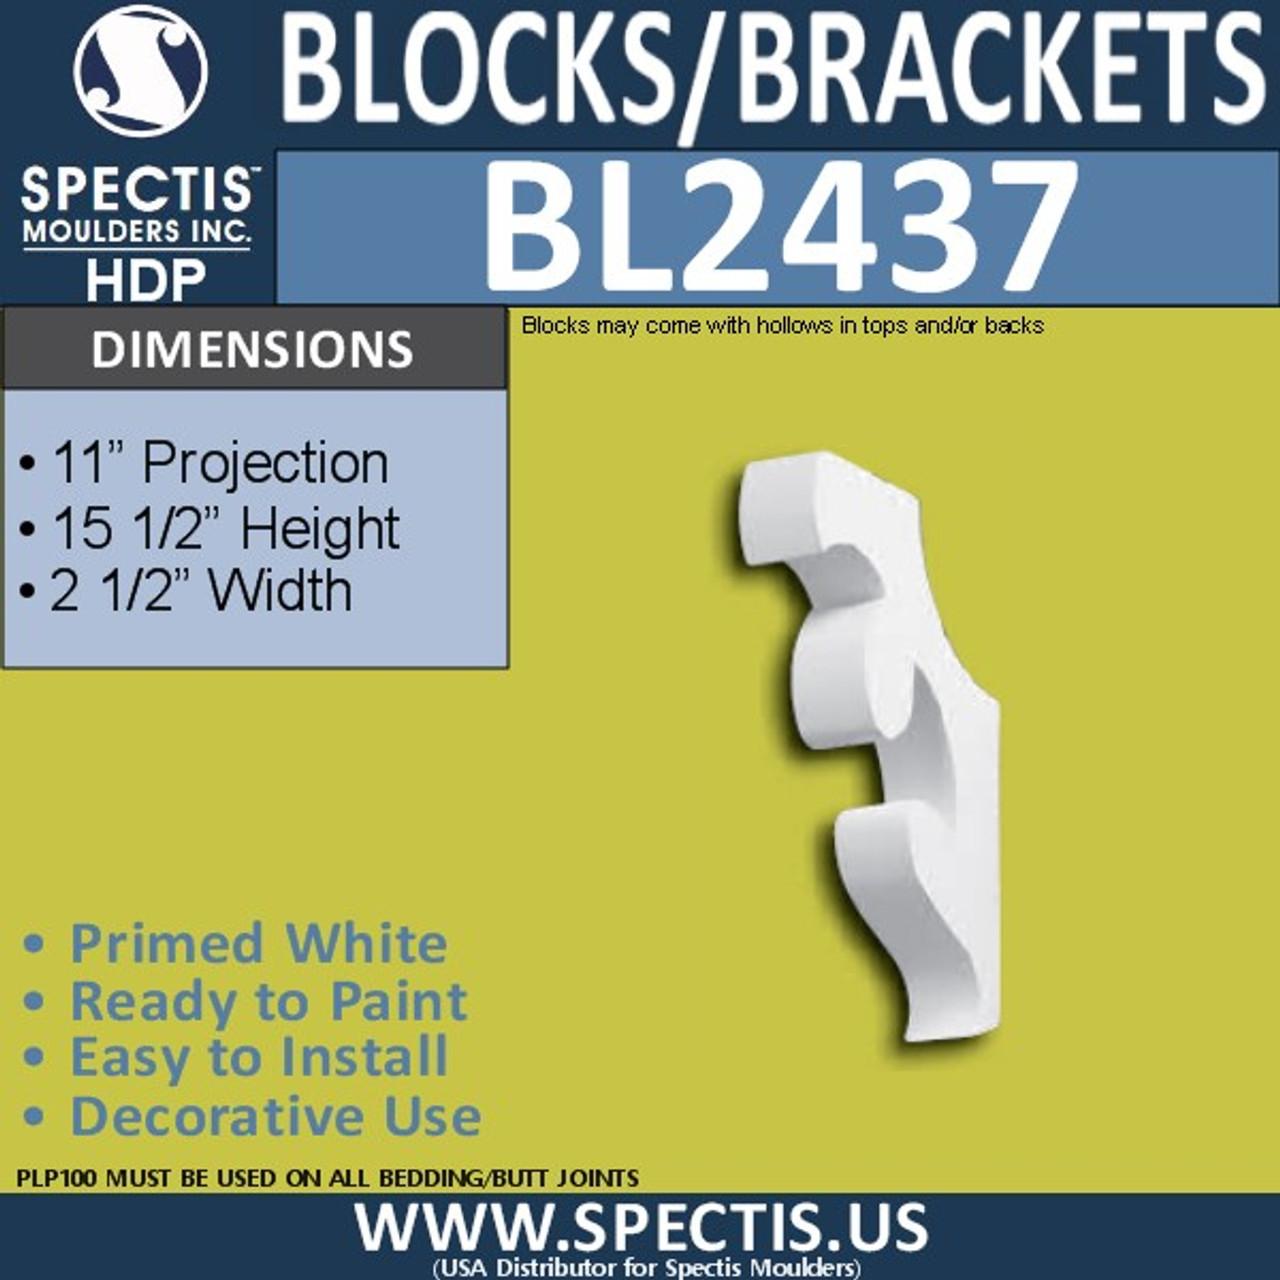 "BL2437 Eave Block or Bracket 2.5""W x 15.5""H x 11"" P"